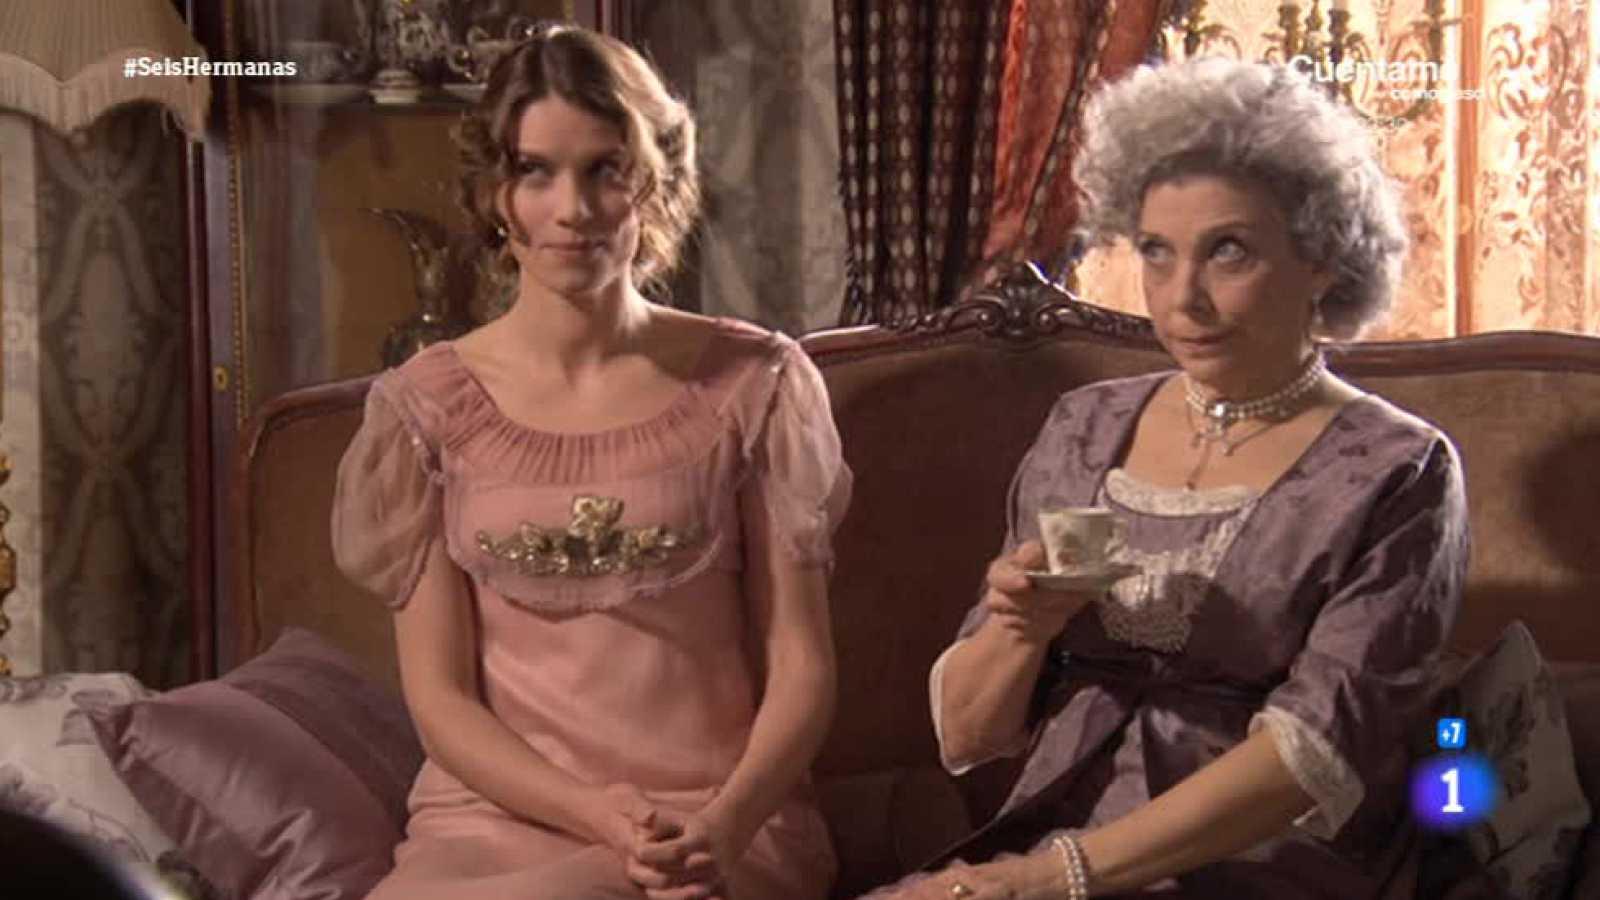 'Seis Hermanas' - Cristóbal vuelve a ayudar a Blanca